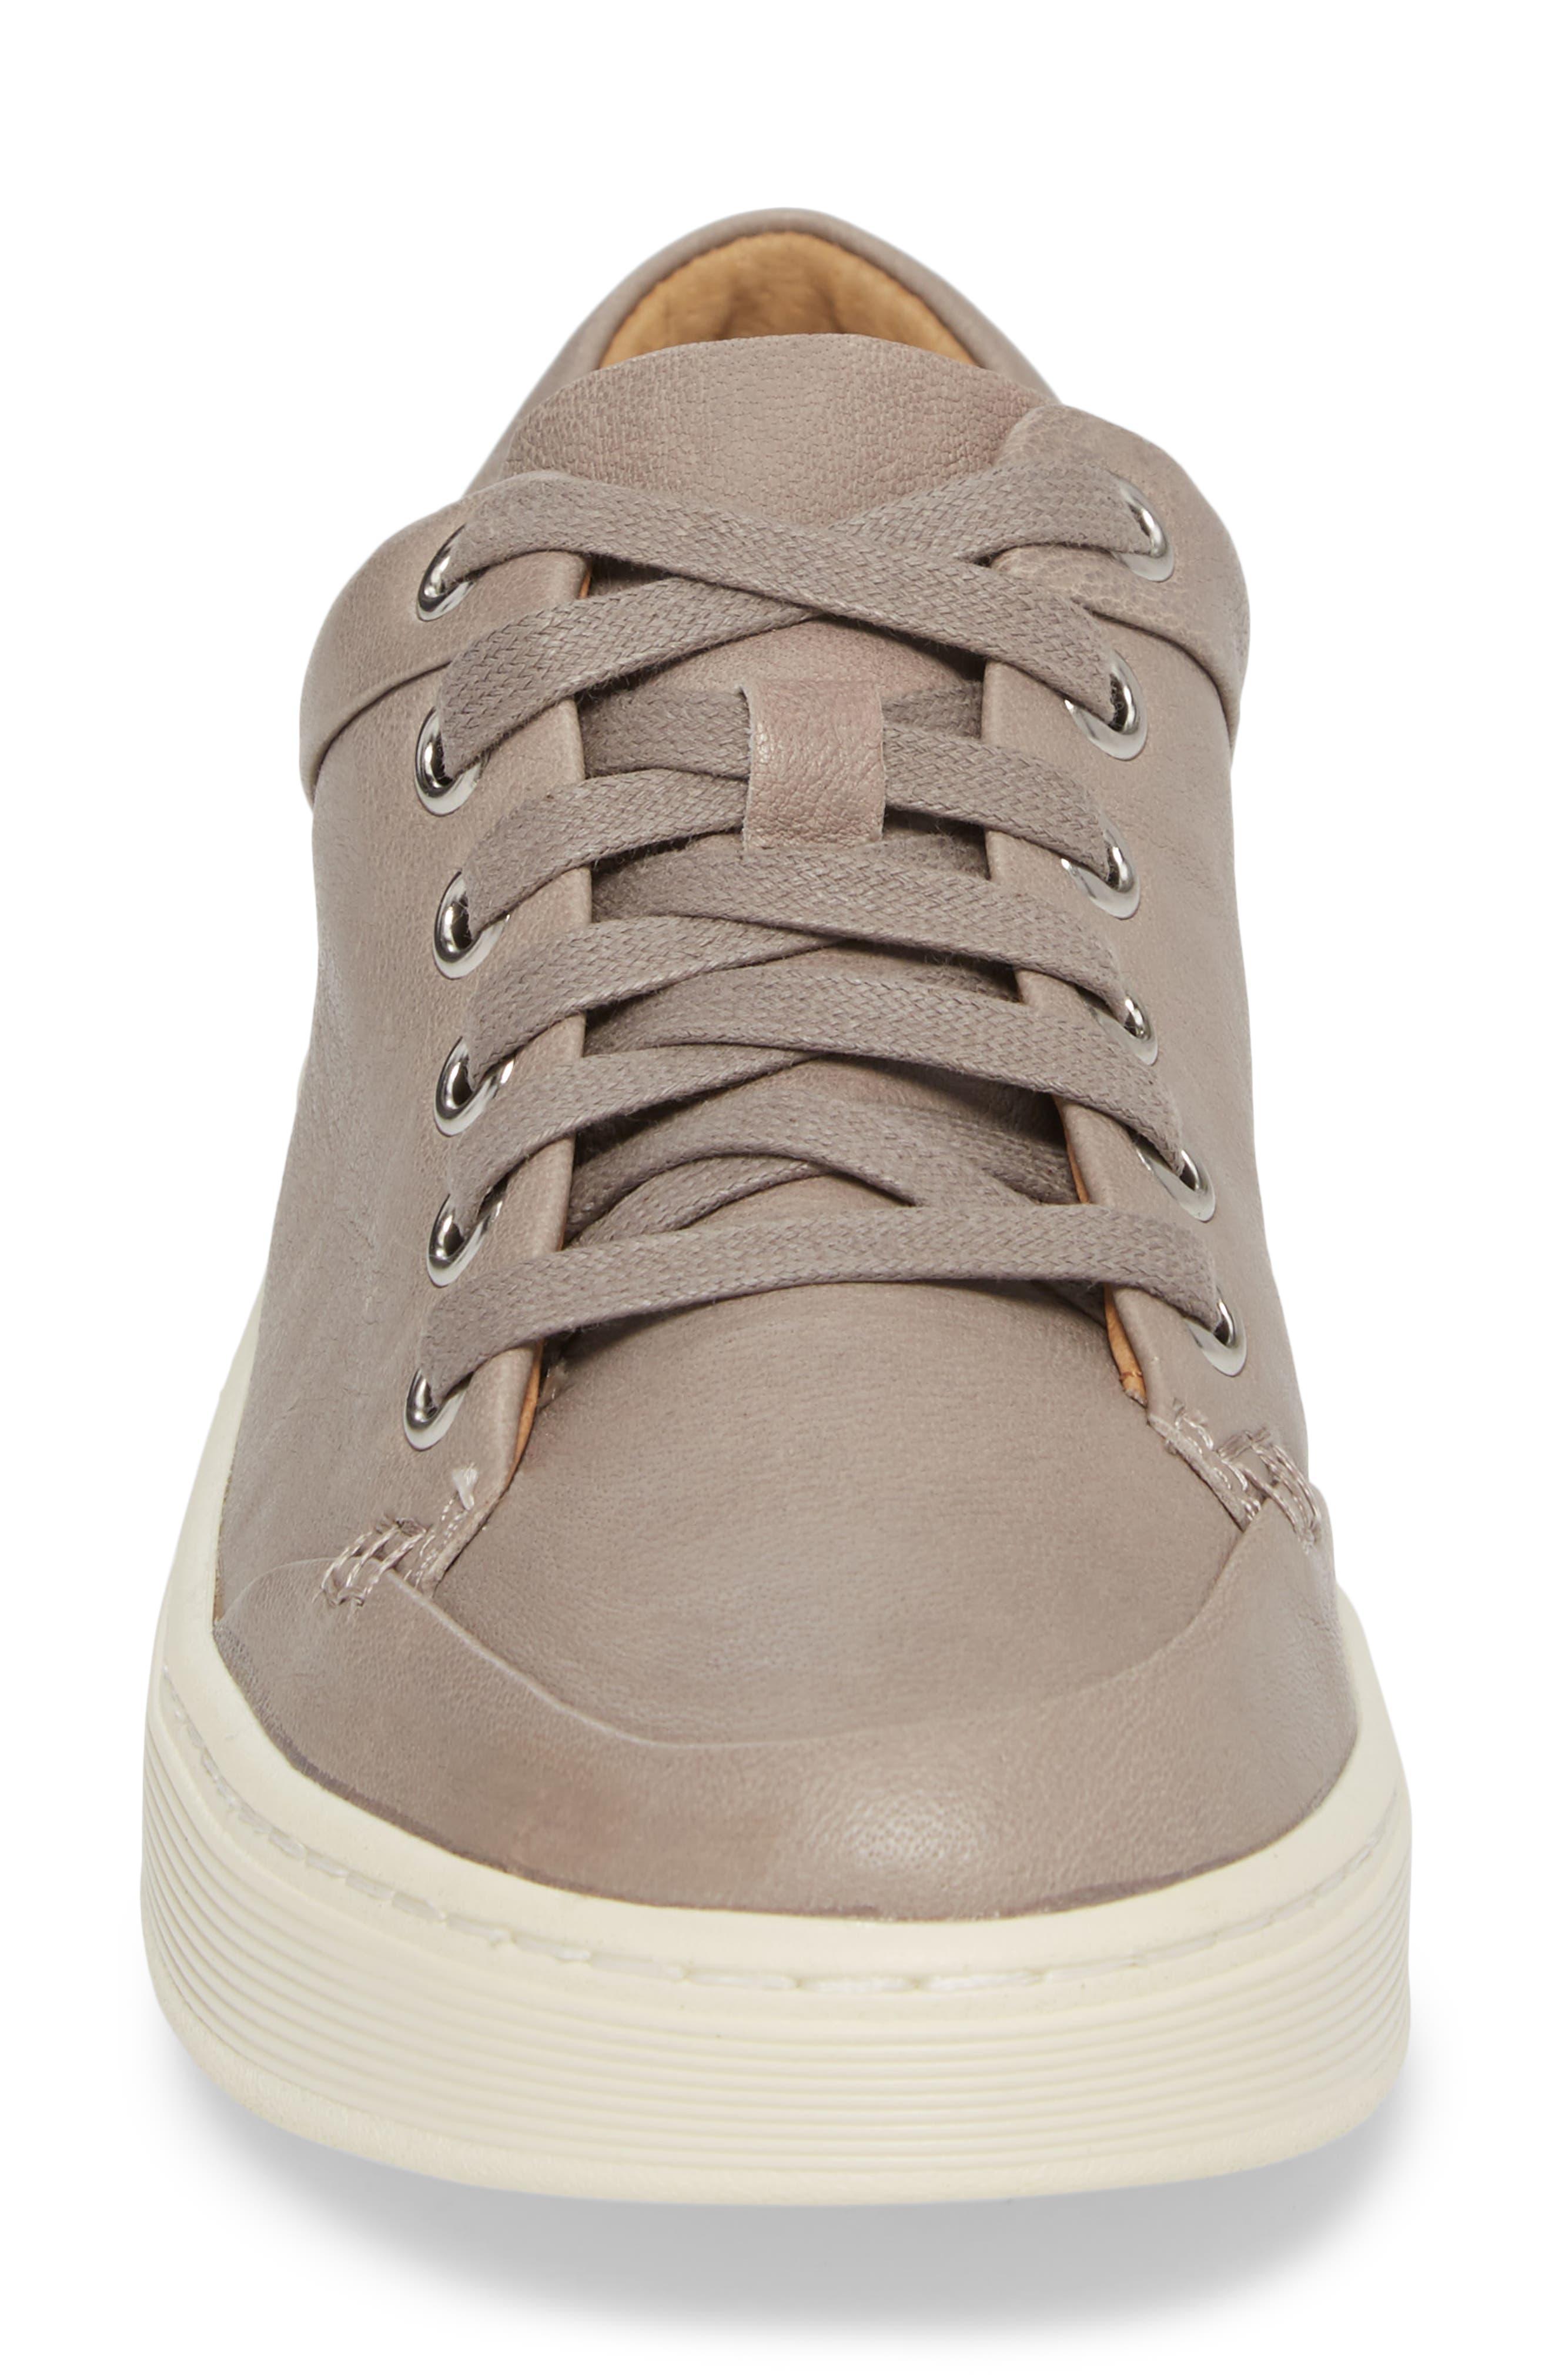 Sanders Sneaker,                             Alternate thumbnail 4, color,                             ZINCO GREY LEATHER